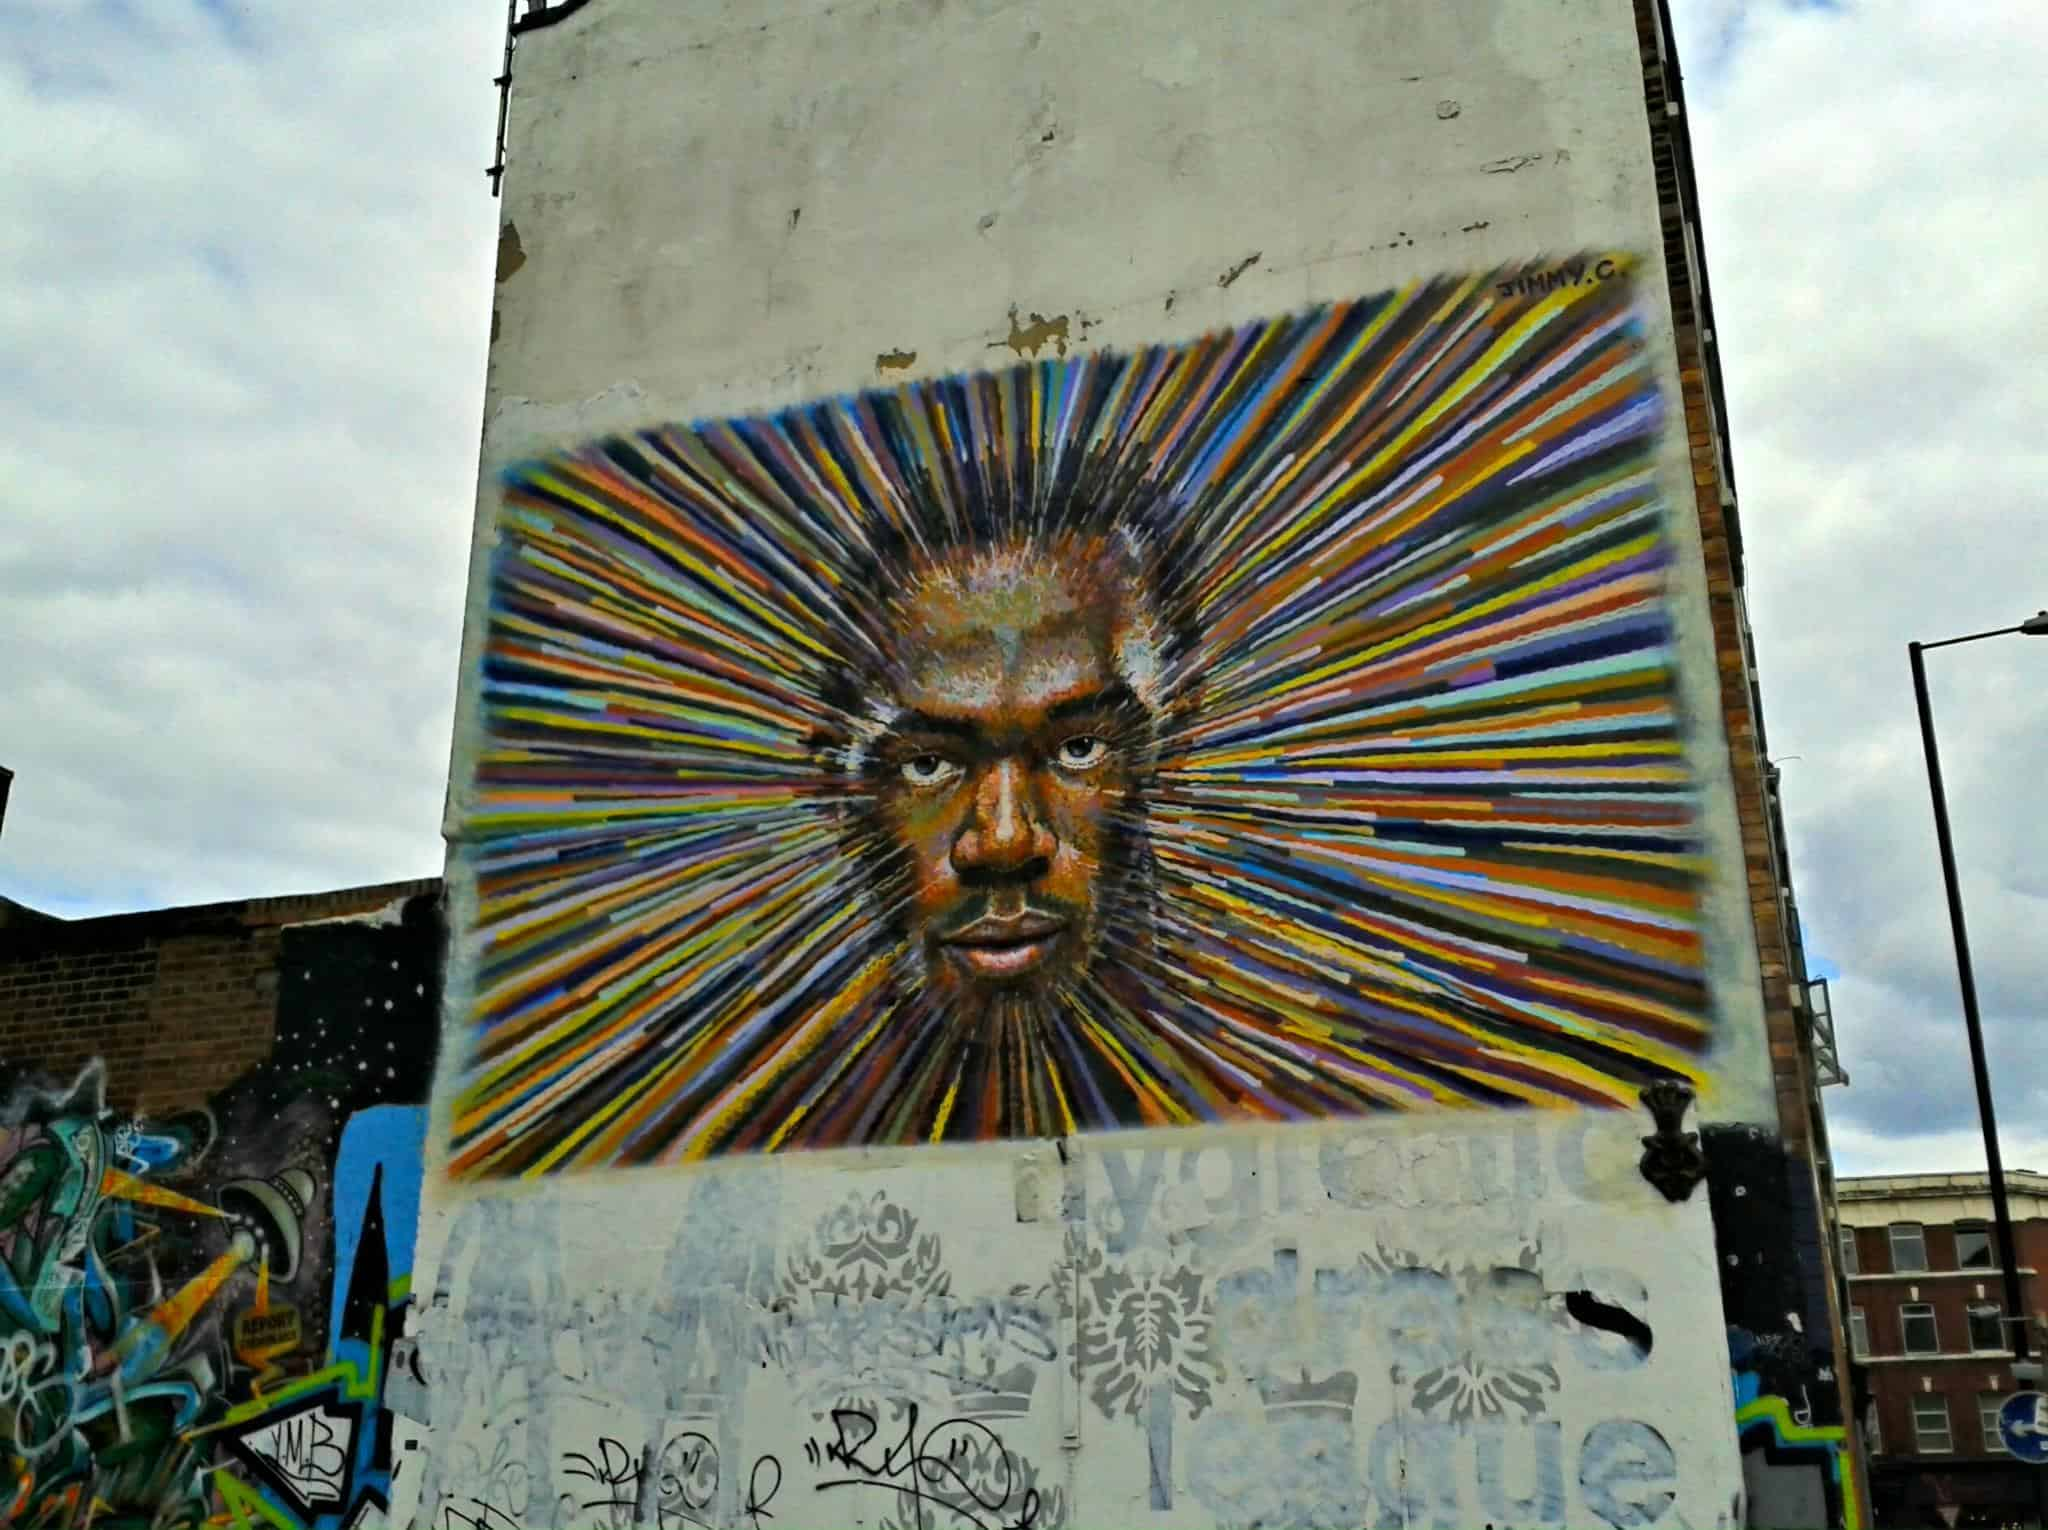 Graffiti in Shoreditch London Usain Bolt by Jimmy C 9422253915